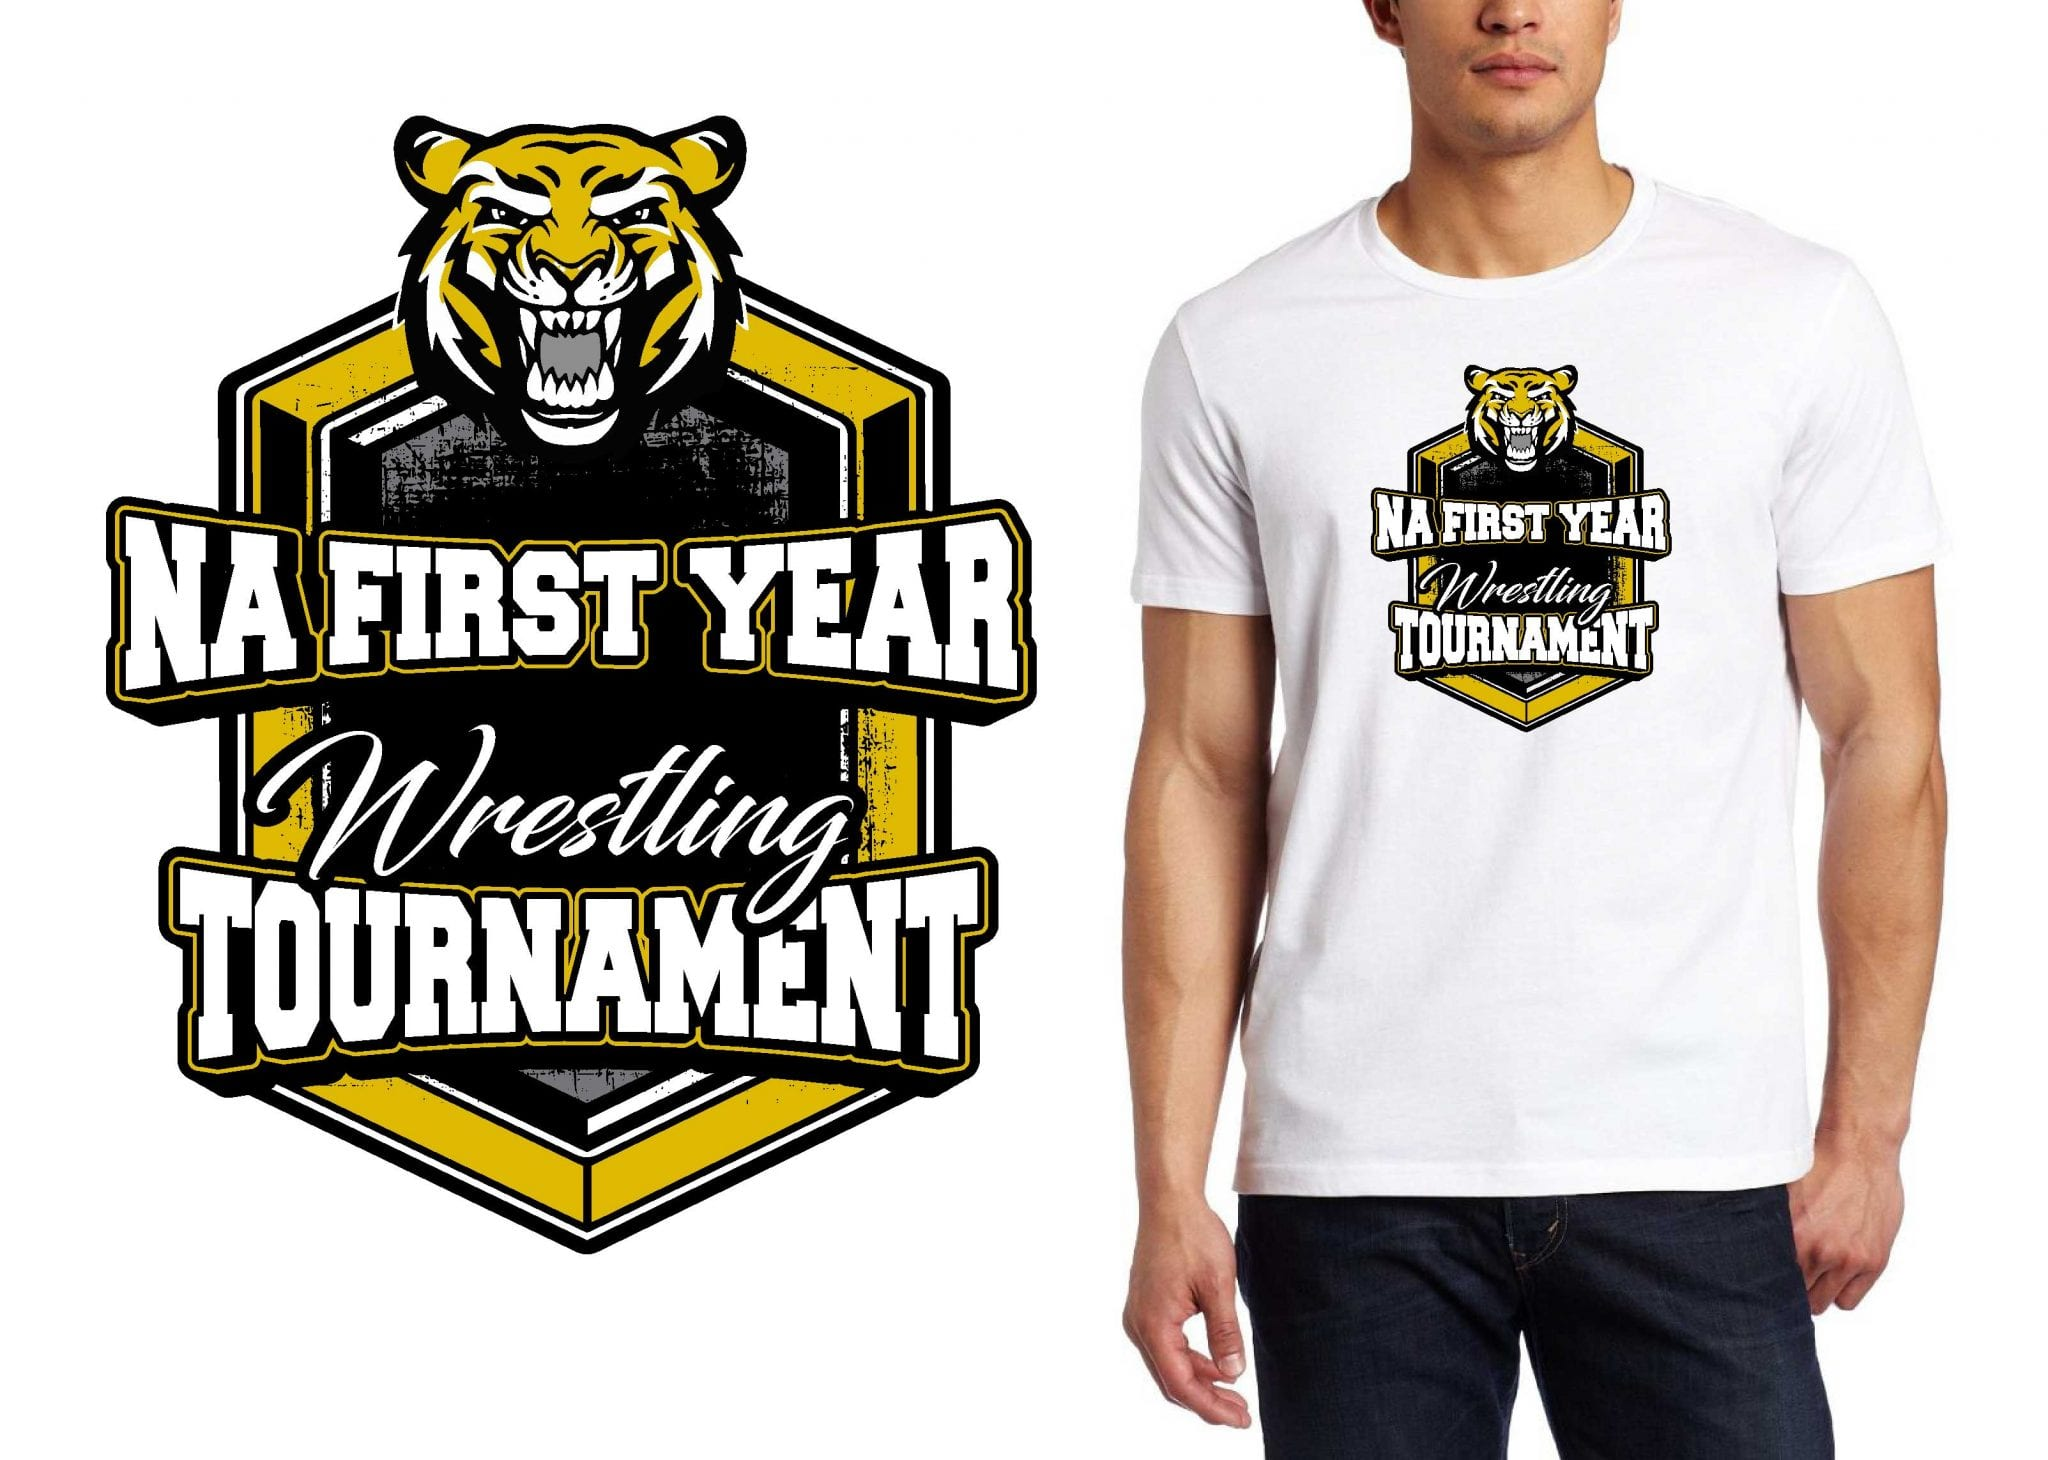 2017 NA 1st and 3rd Year Wreslting Tournament vector logo design for t-shirt UrArtStudio